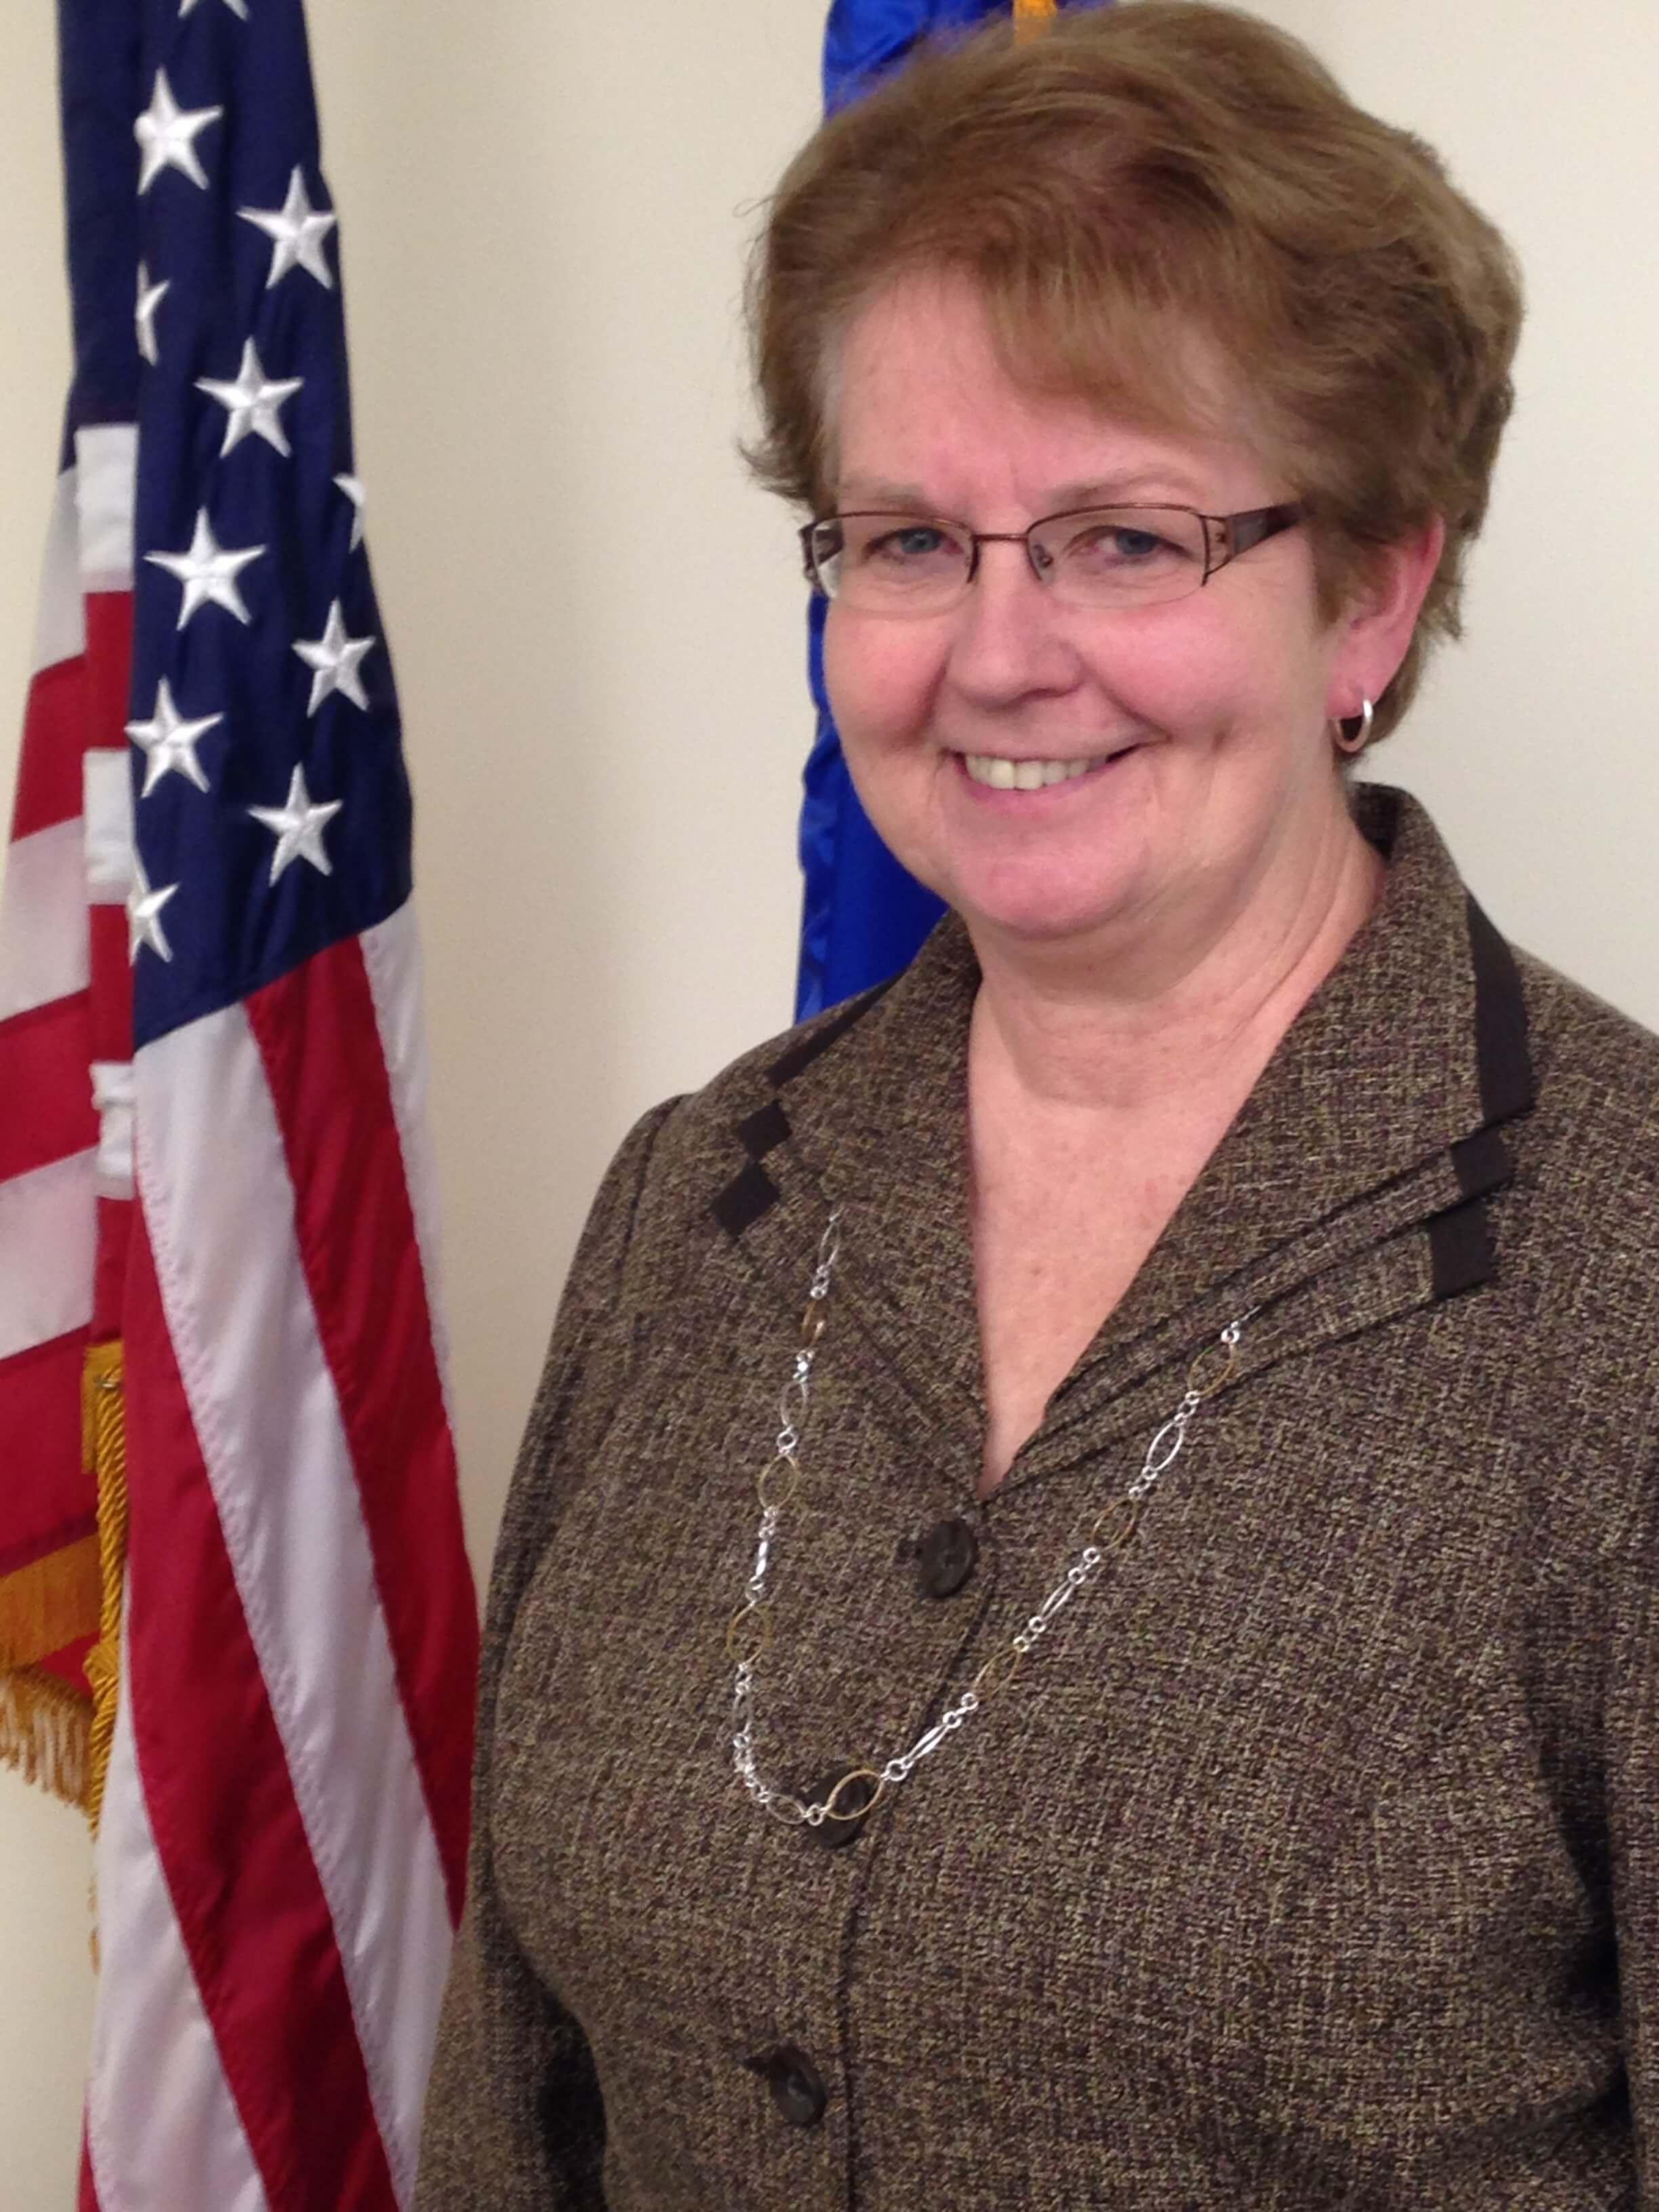 Kathy Stoeckel